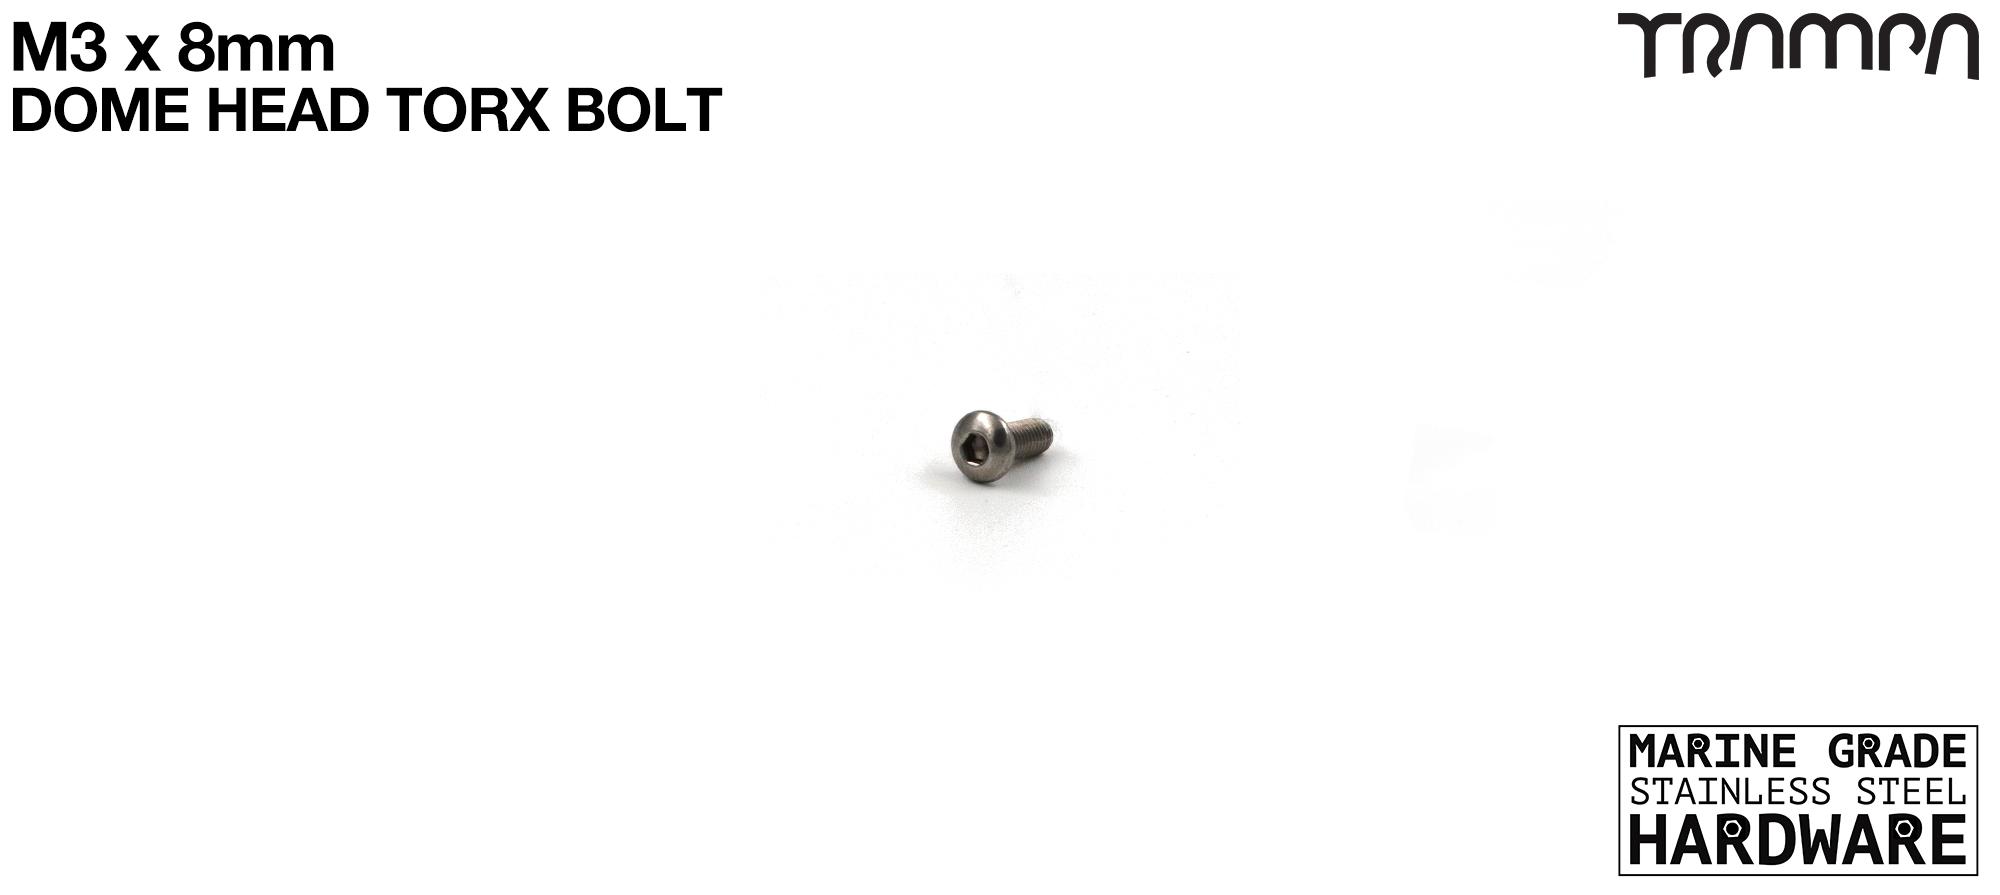 M3 x 8mm Dome Headed Head Allen-Key Bolt Marine Grade Stainless Steel